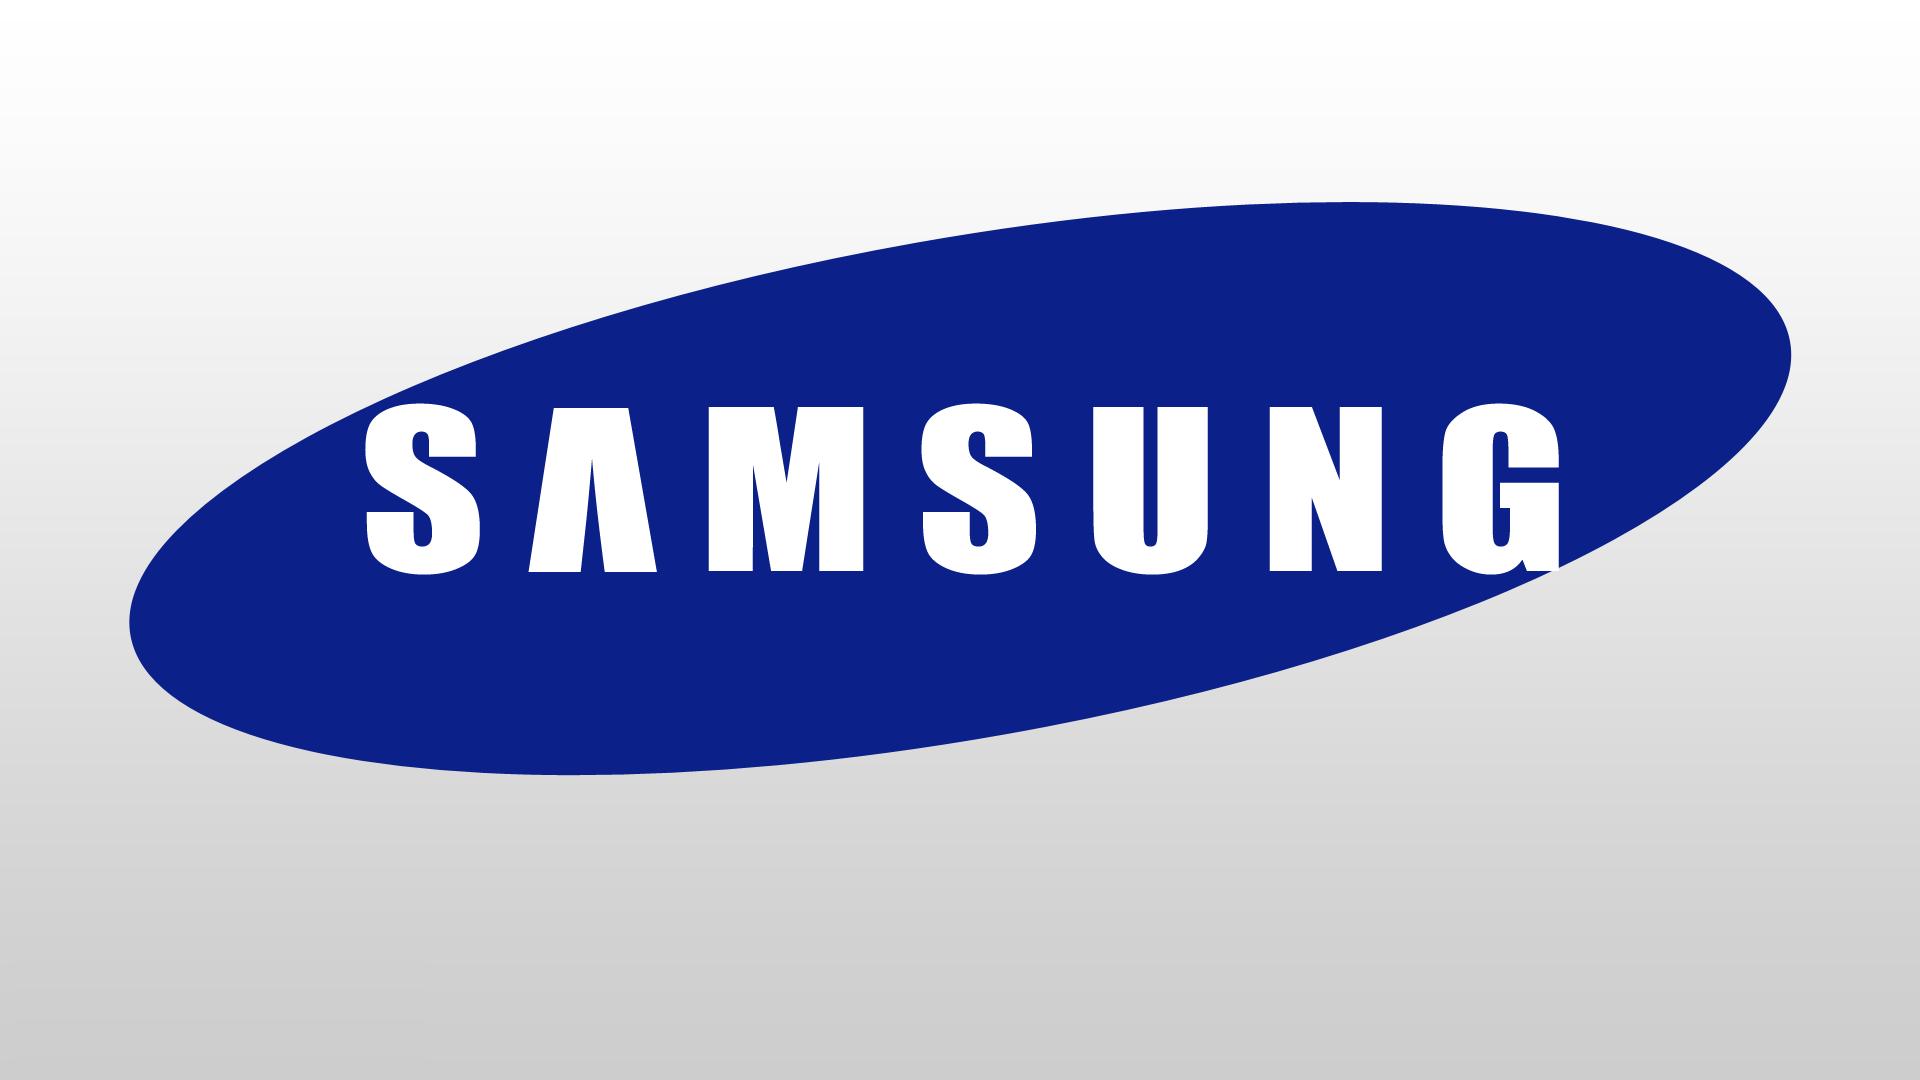 SamsungLogo.png - Samsung HD PNG